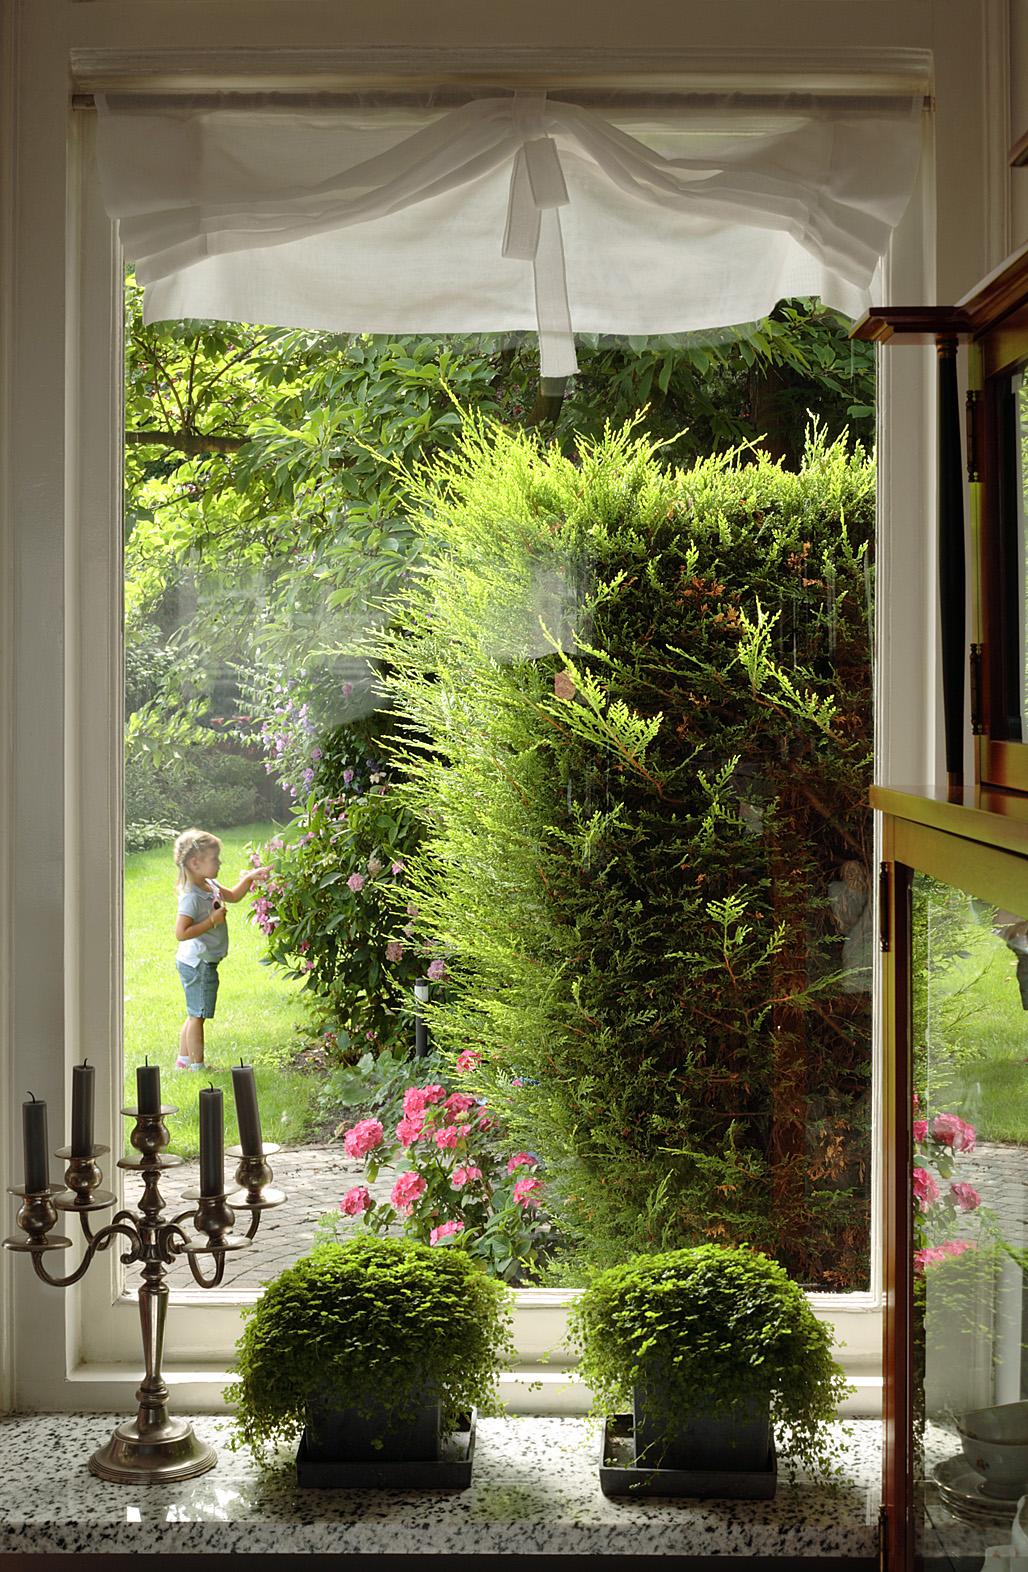 Duże, holenderskie okna